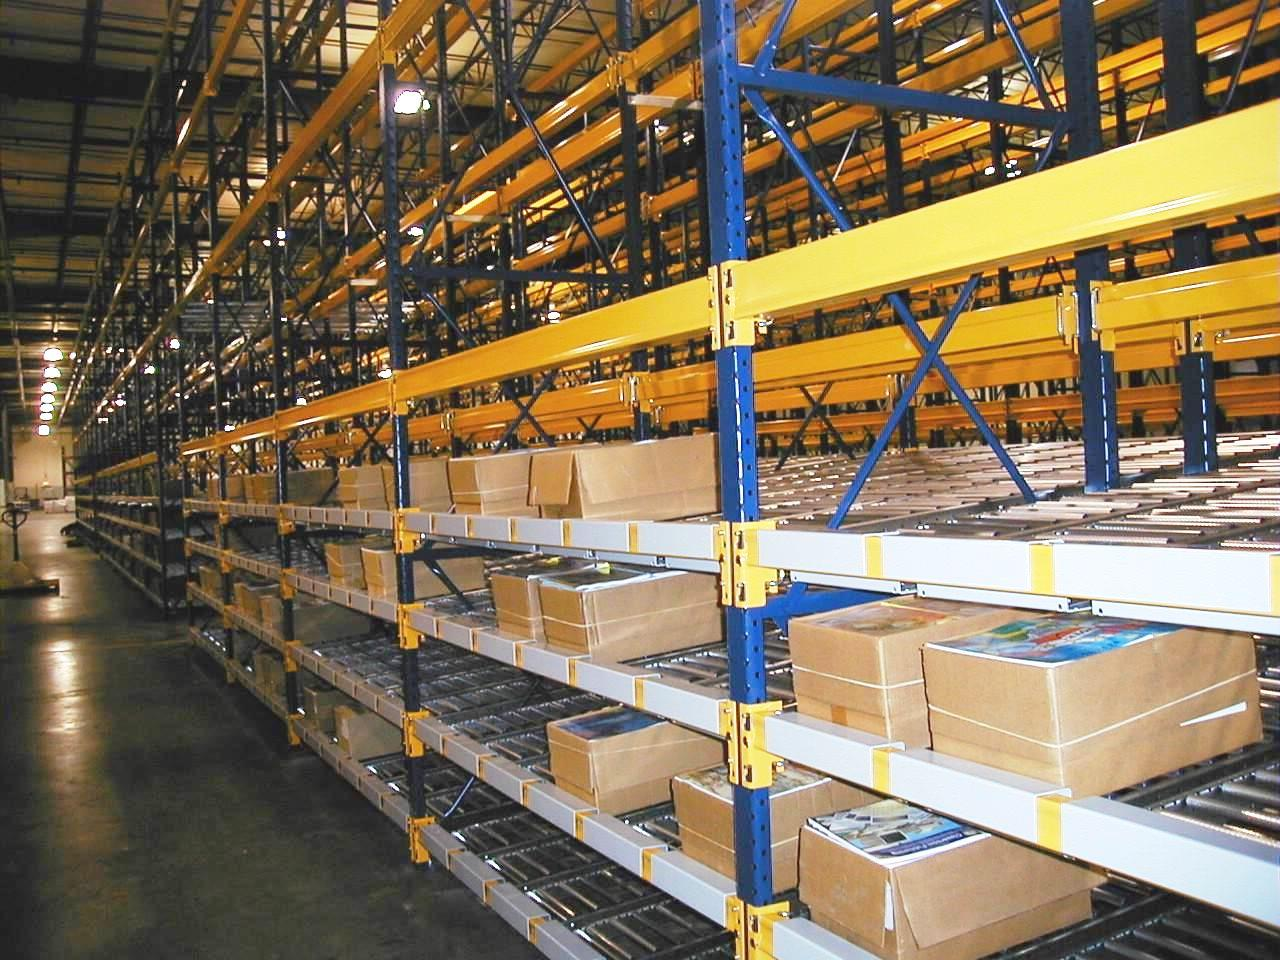 Carton Flow Racks Warehouse Design